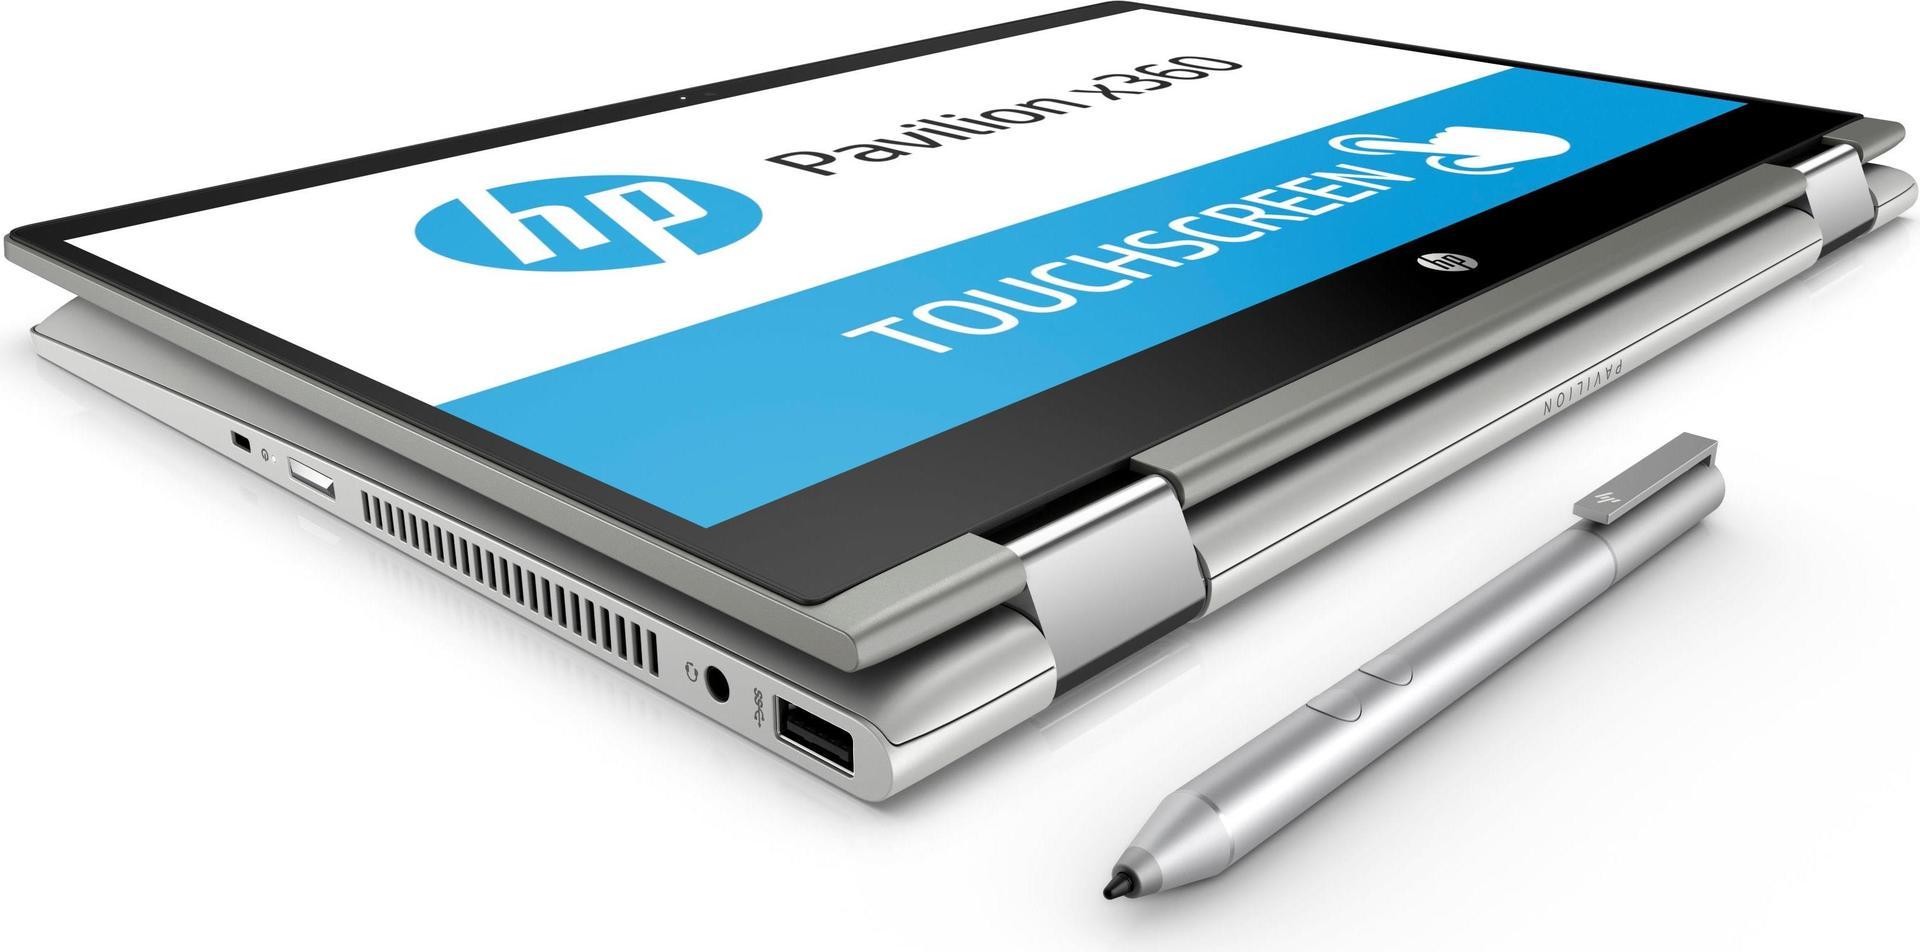 Notebooks, Laptops - HP Inc HP Pavilion x360 14 cd0101ng Flip Design Core i5 8250U 1.6 GHz Win 10 Home 64 Bit 8 GB RAM 256 GB SSD NVMe 35.6 cm (14) IPS Touchscreen 1920 x 1080 (Full HD) UHD Graphics 620 Wi Fi, Bluetooth Mineral Silberfarben  - Onlineshop JACOB Elektronik